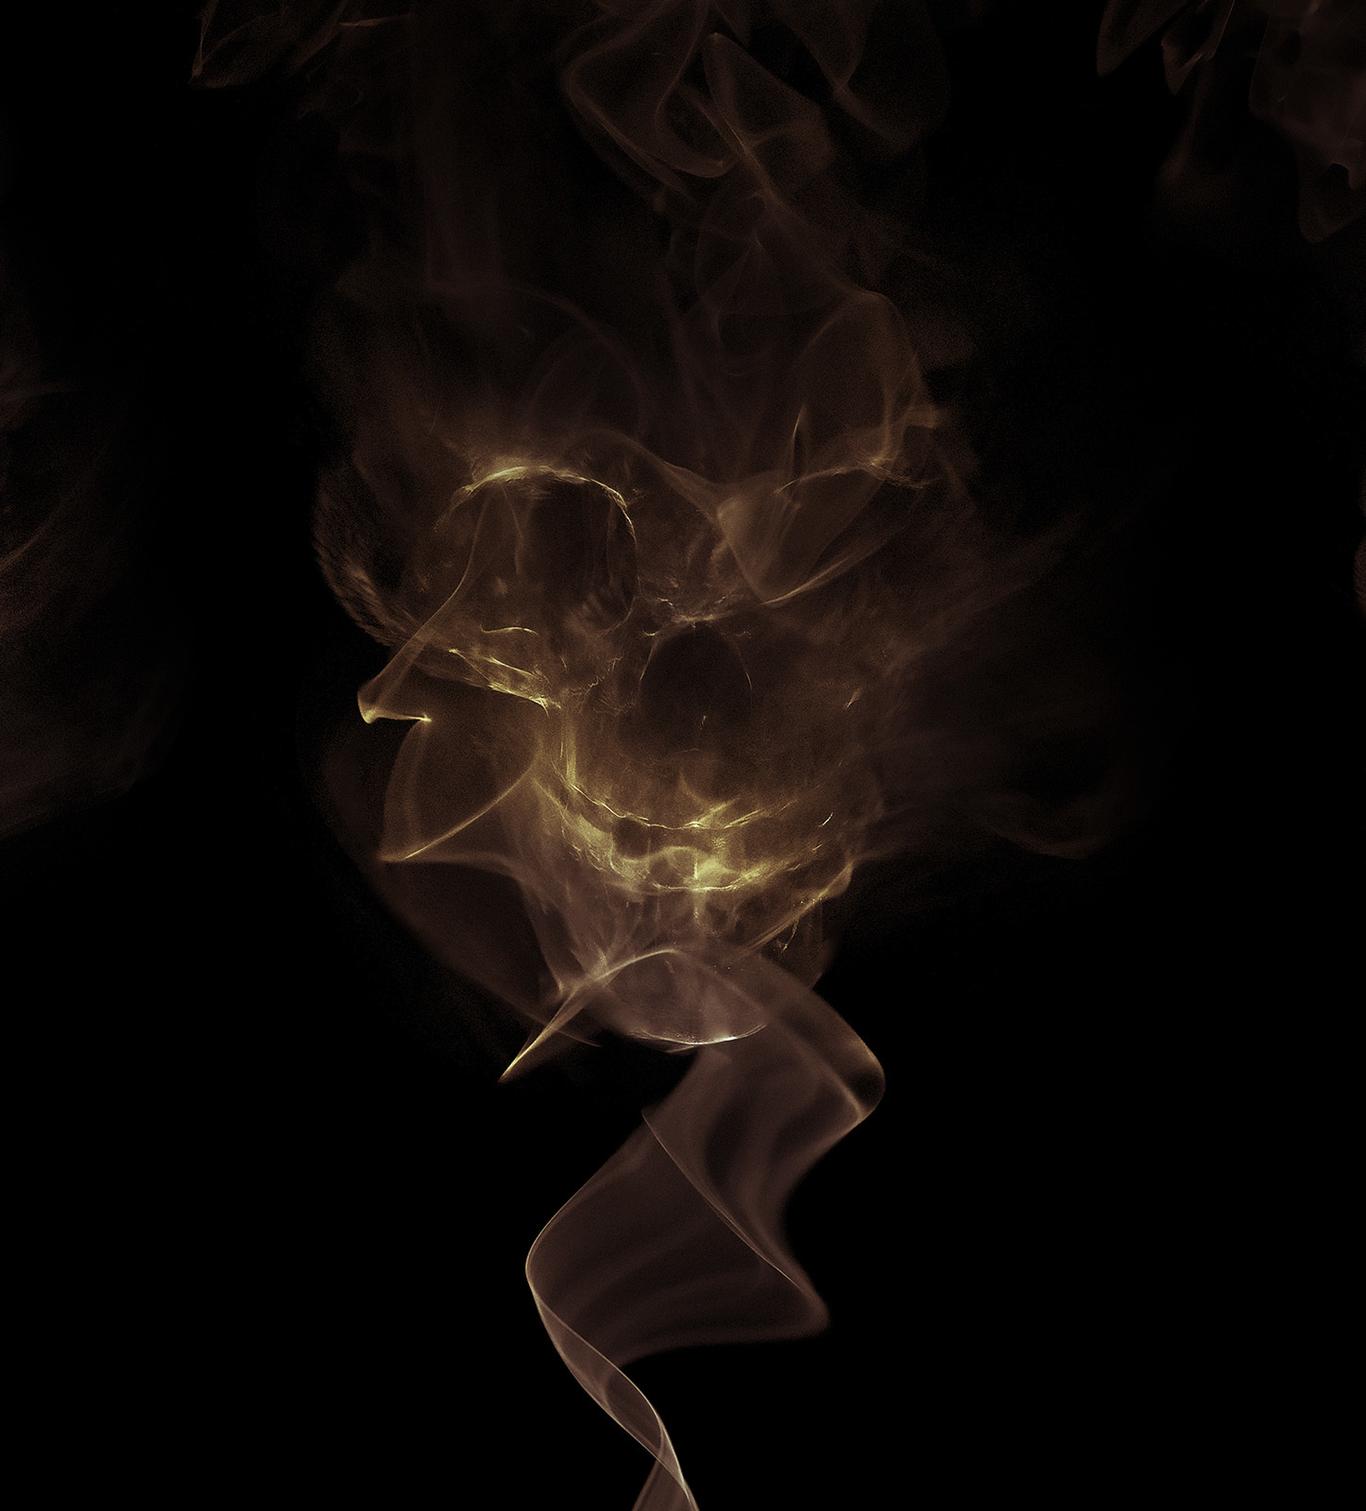 Simmsimaging smoke skulls 1 aee49d8e bia7